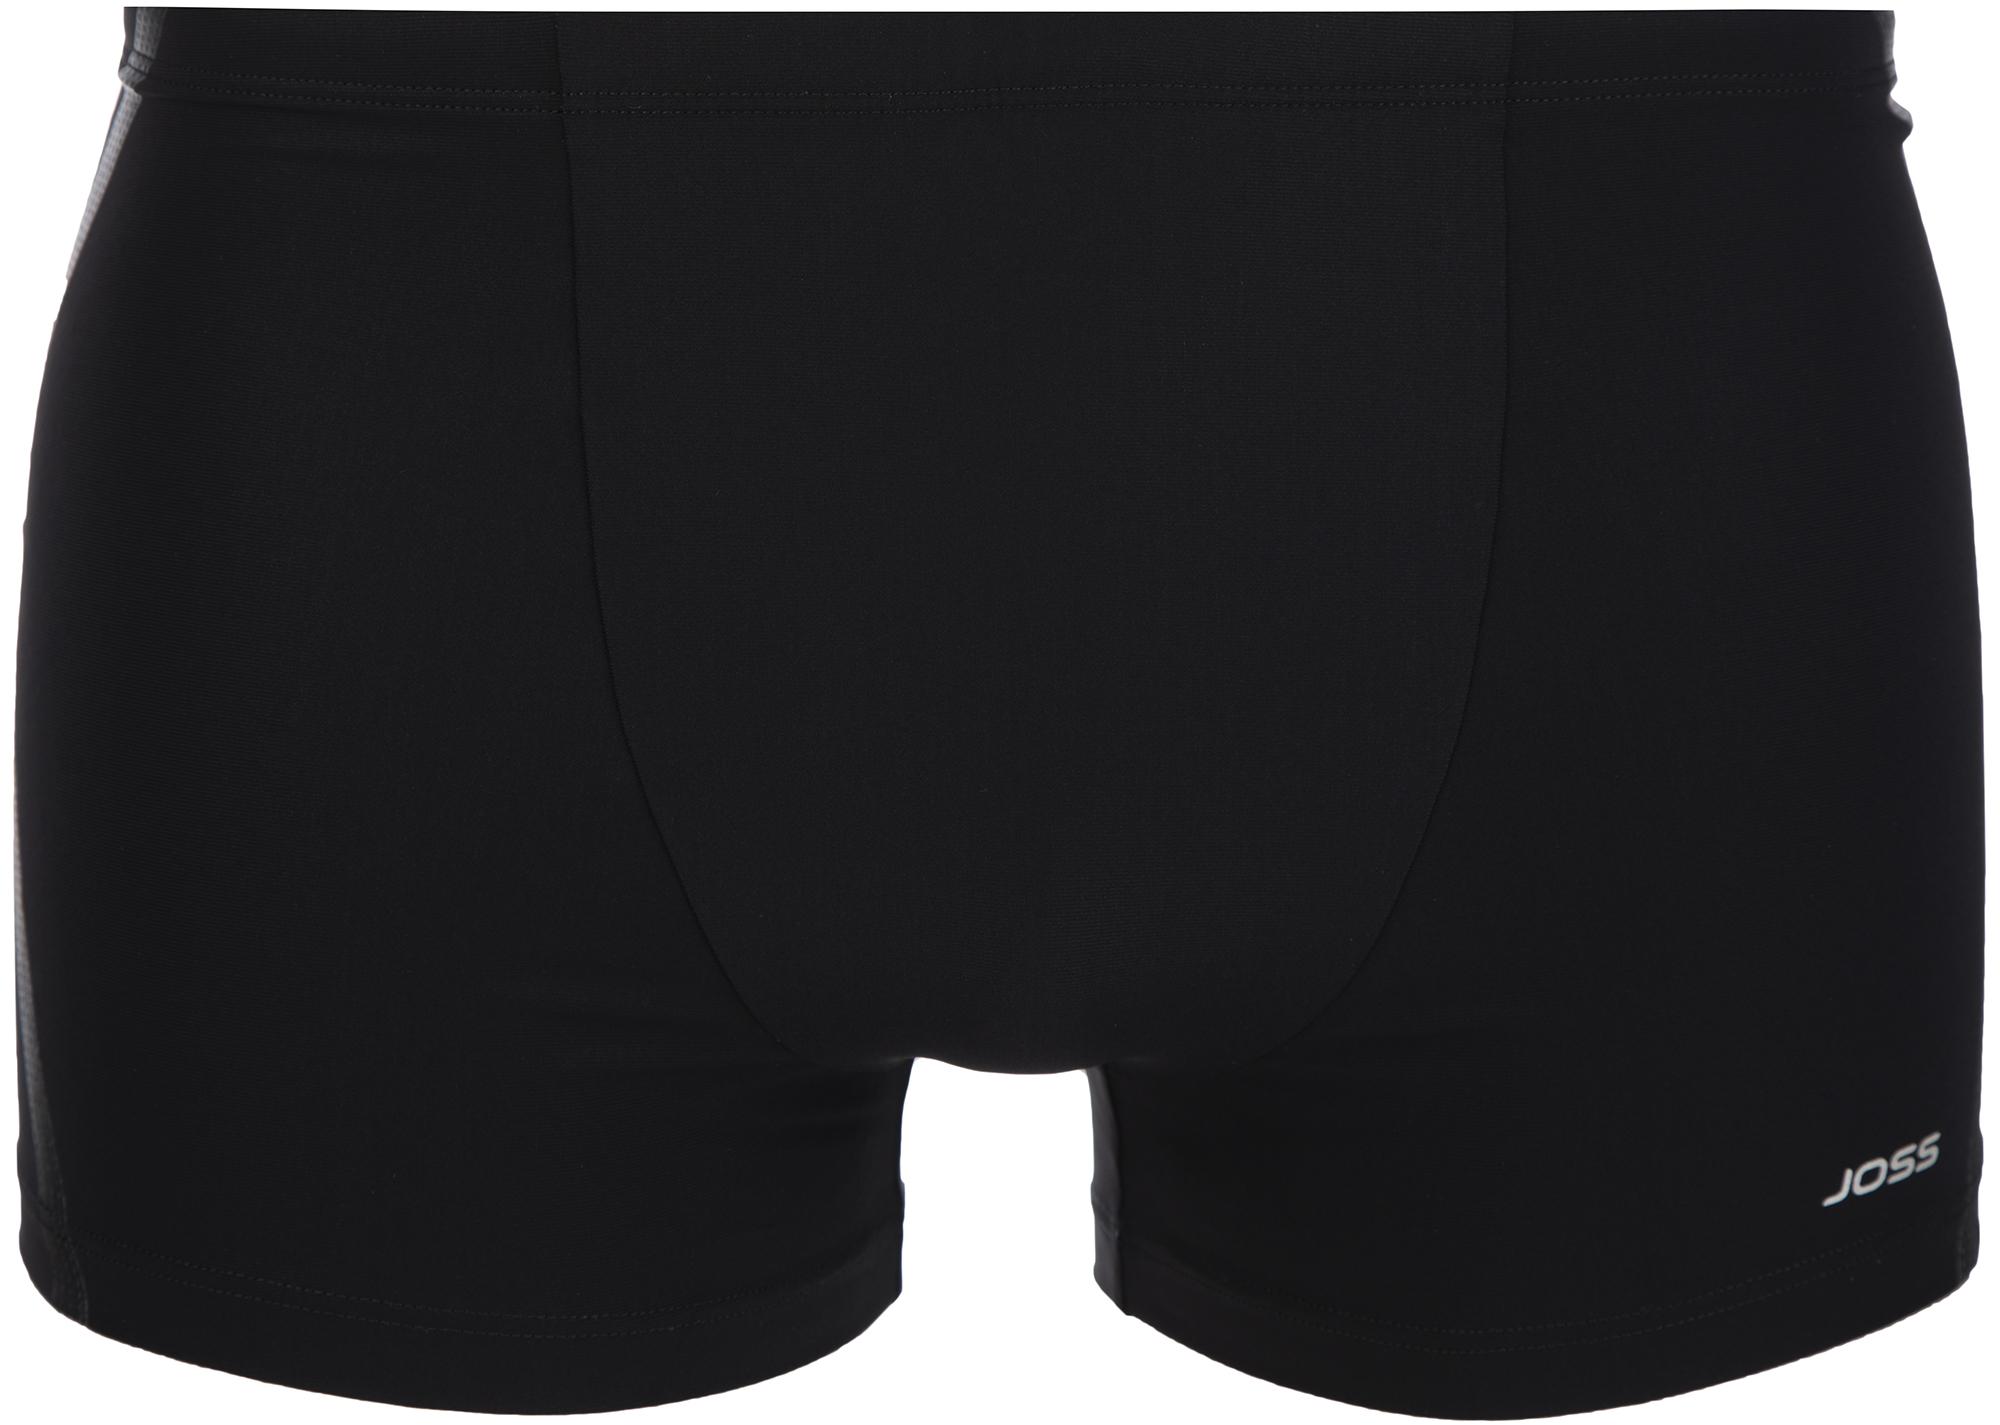 лучшая цена Joss Плавки-шорты мужские Joss, размер 58